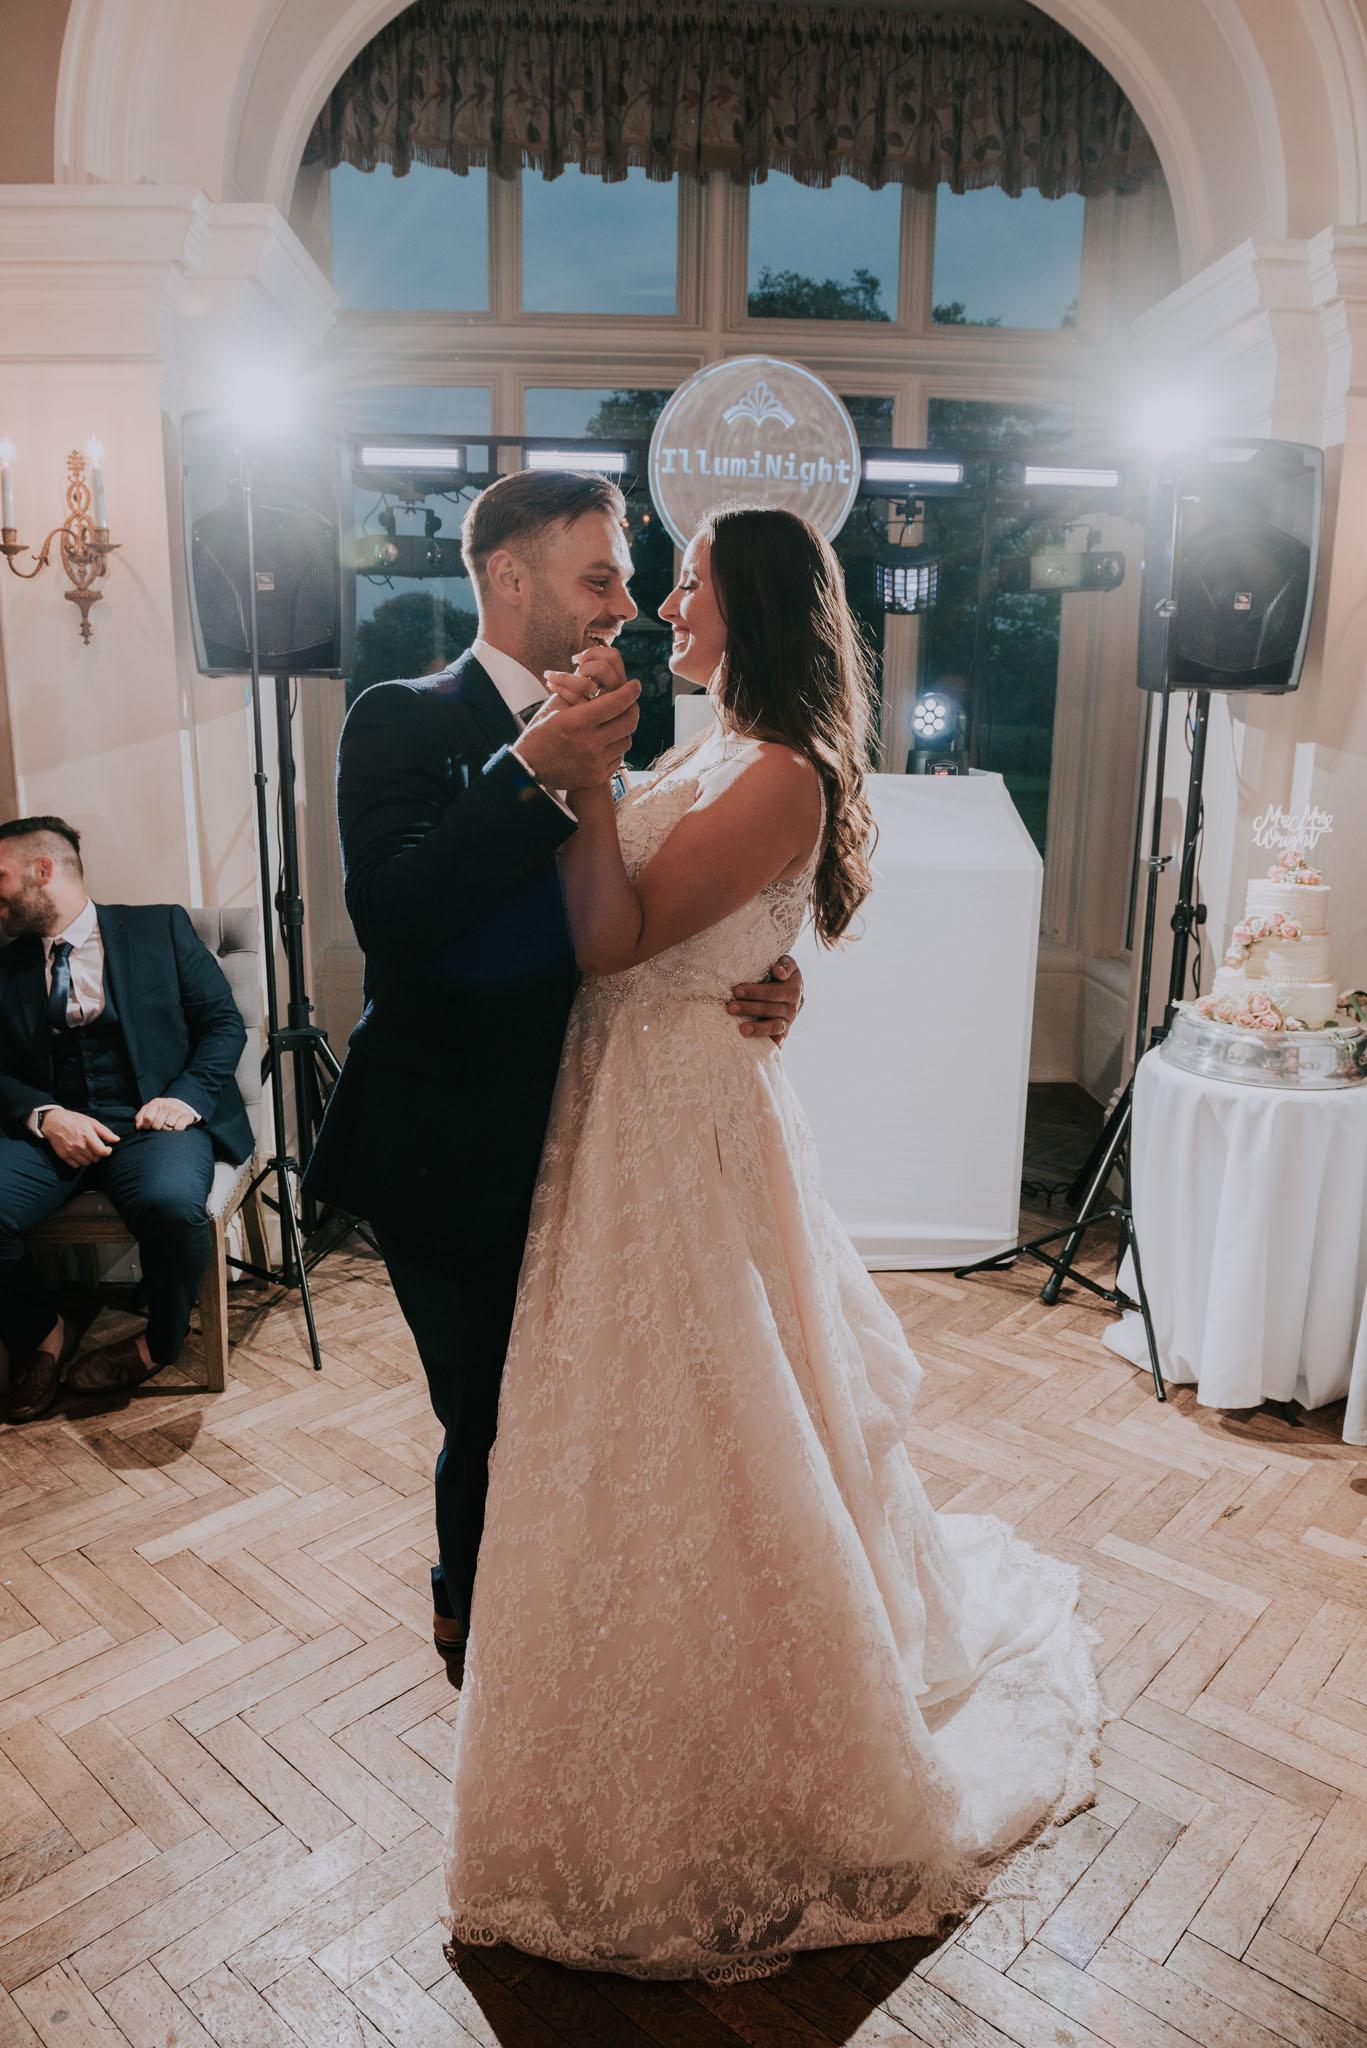 wedding-photographer-glewstone-court-hereford-scott-stockwell-photography473.jpg